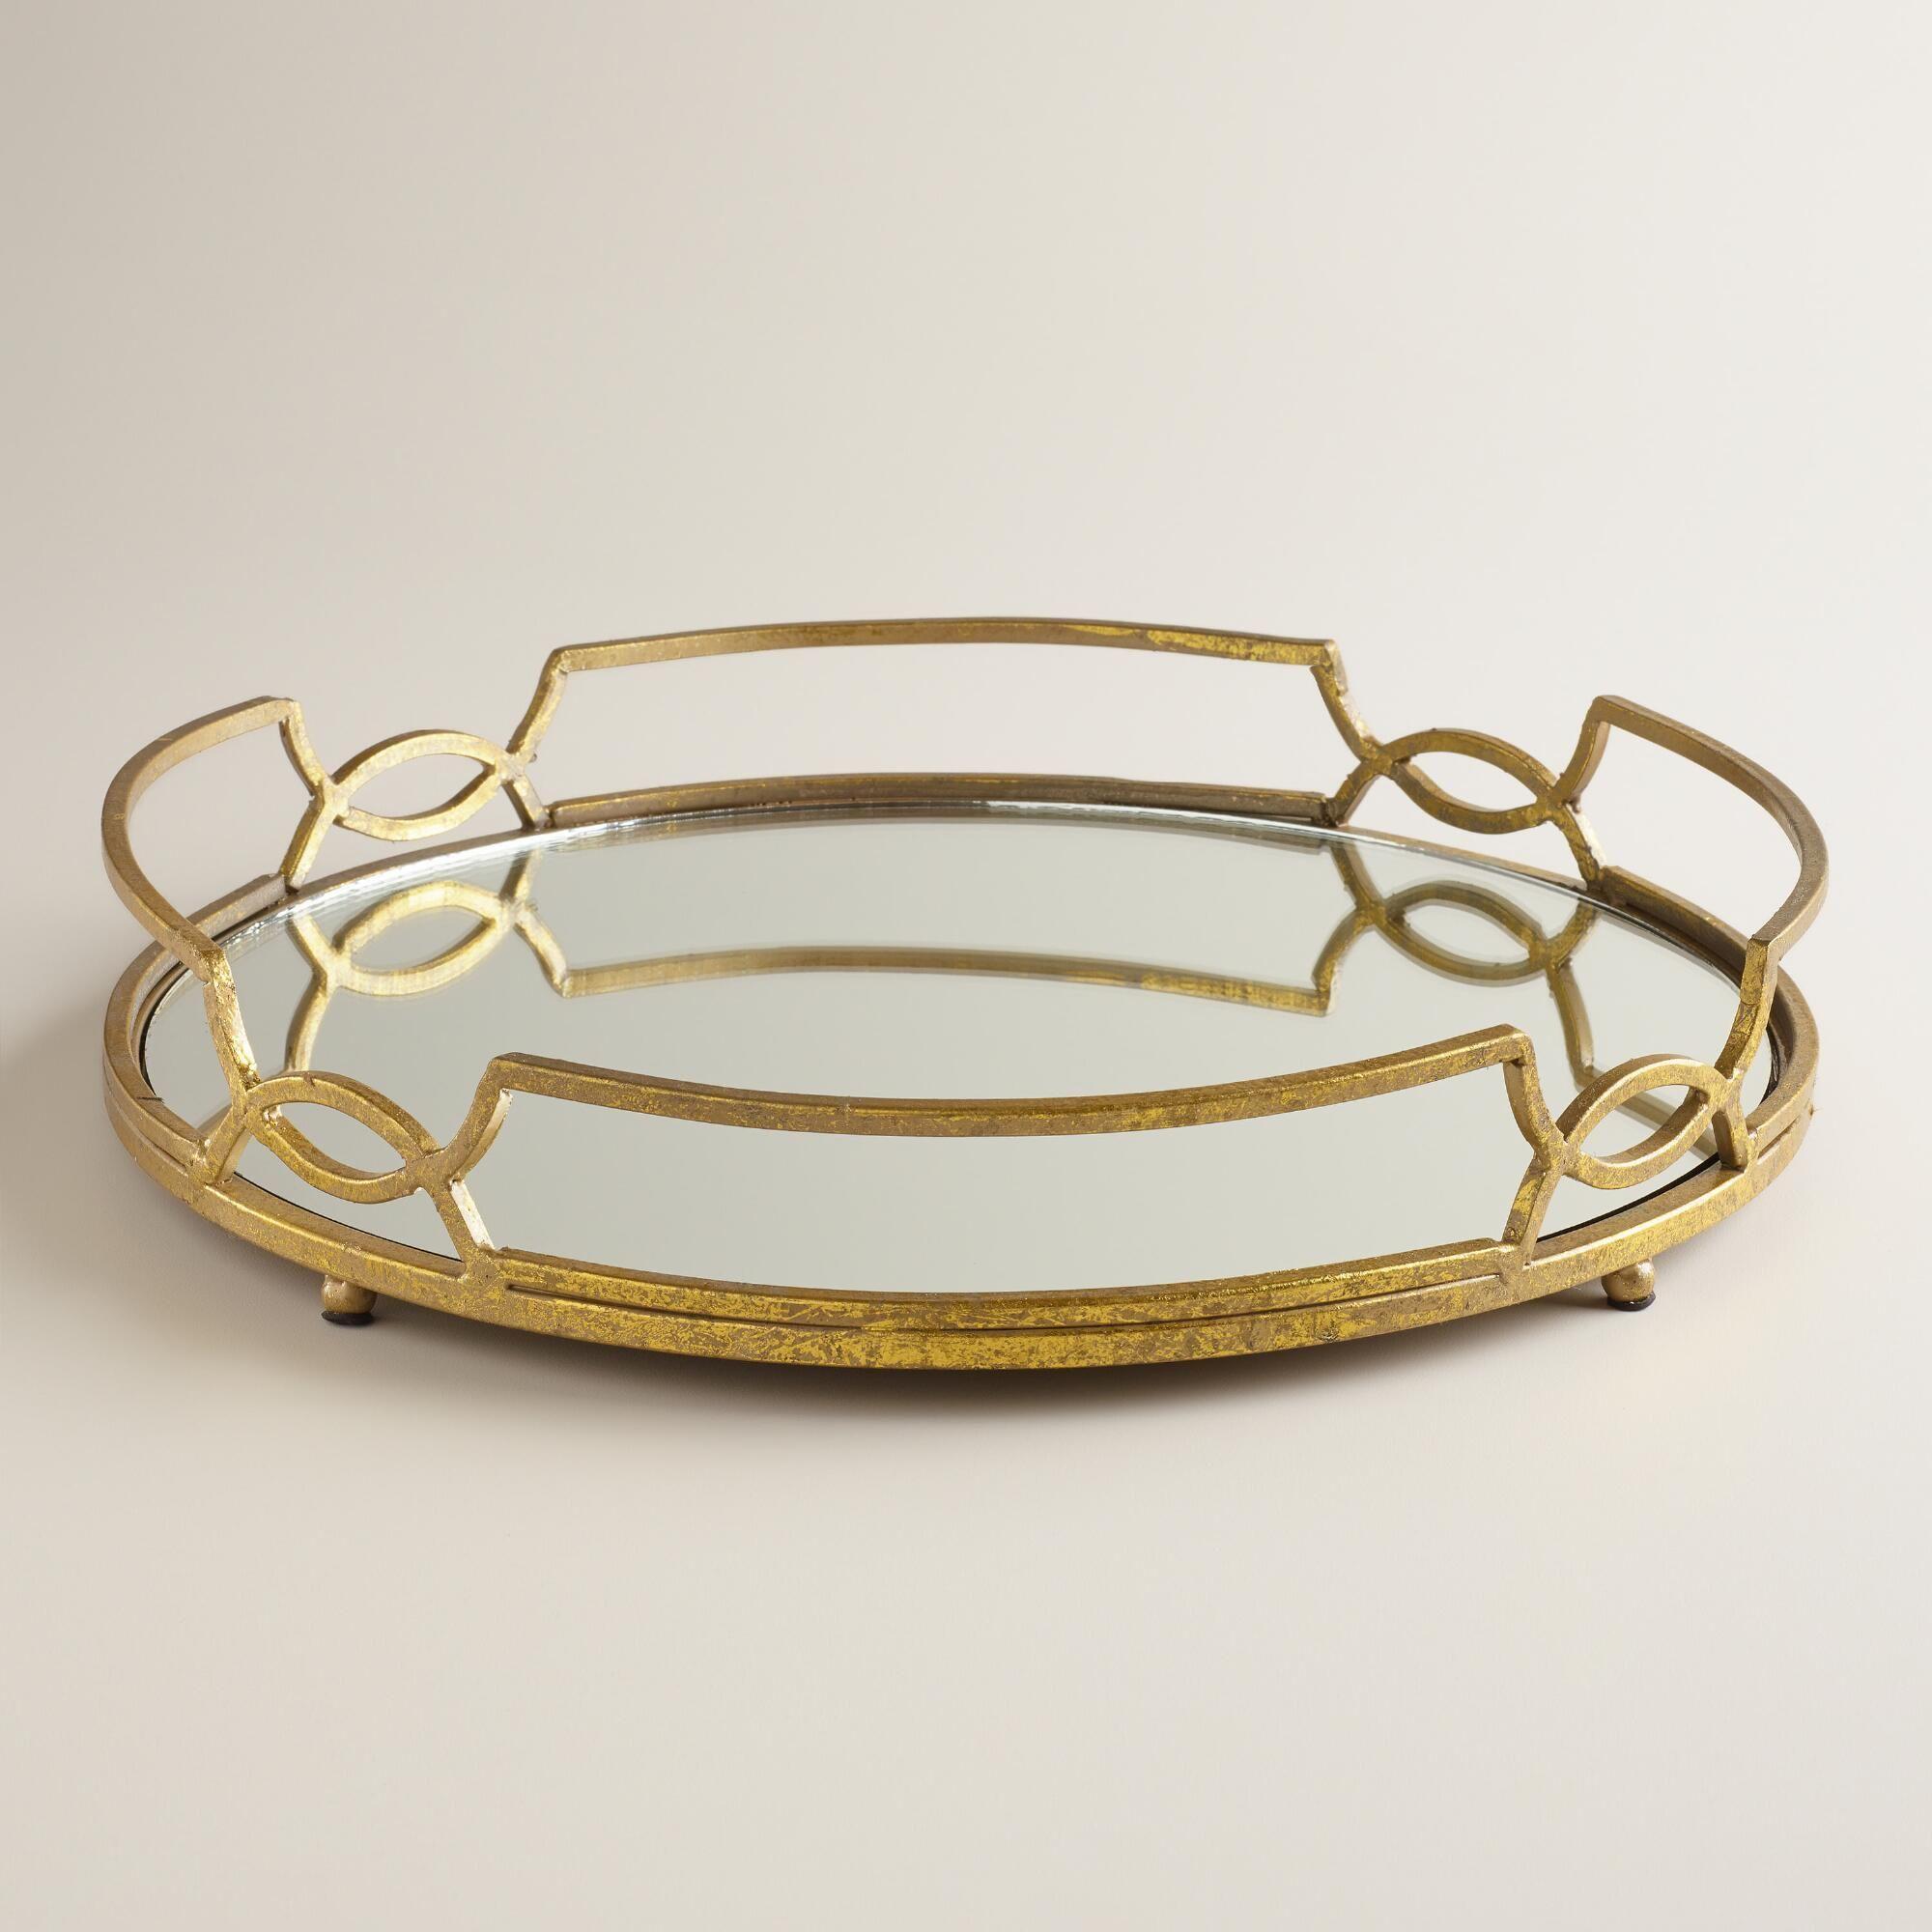 f30dc25901082c378e77a430756a7e3d Top Result 50 Best Of Gold and Glass Coffee Table Image 2017 Ksh4